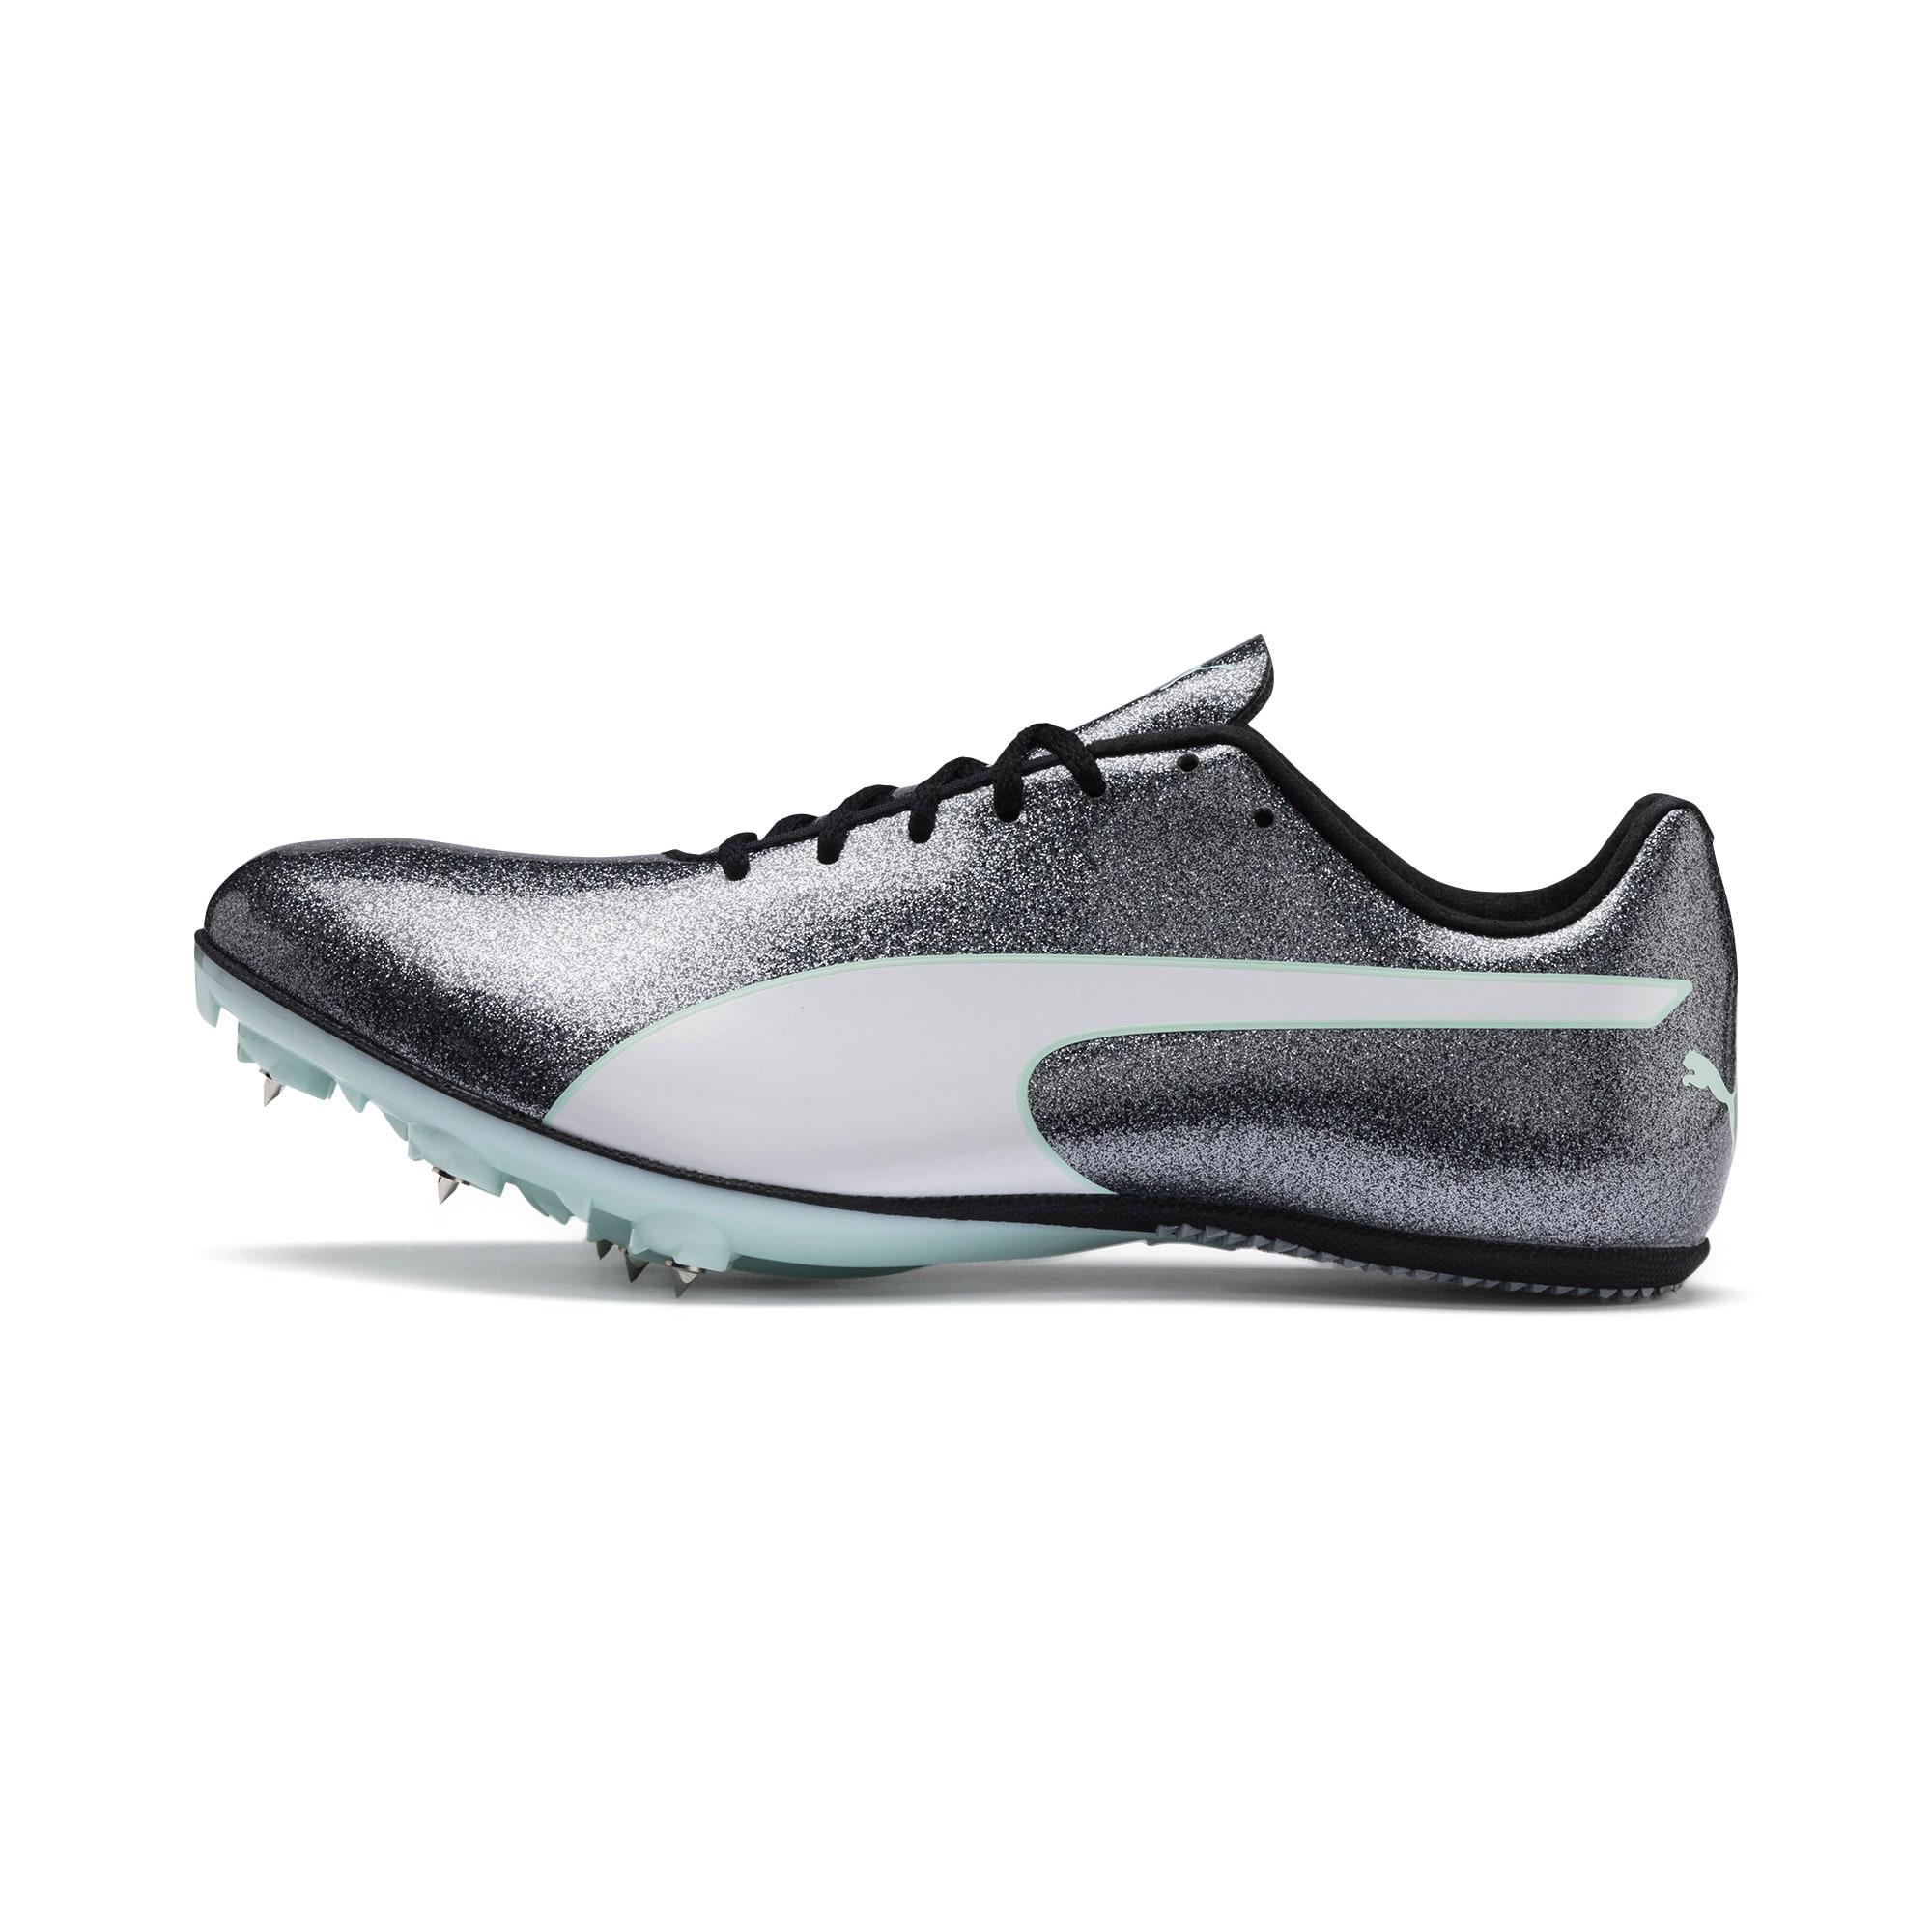 Thumbnail 1 of evoSPEED Sprint 9 Women's Running Shoes, Steel Gray-Fair Aqua-White, medium